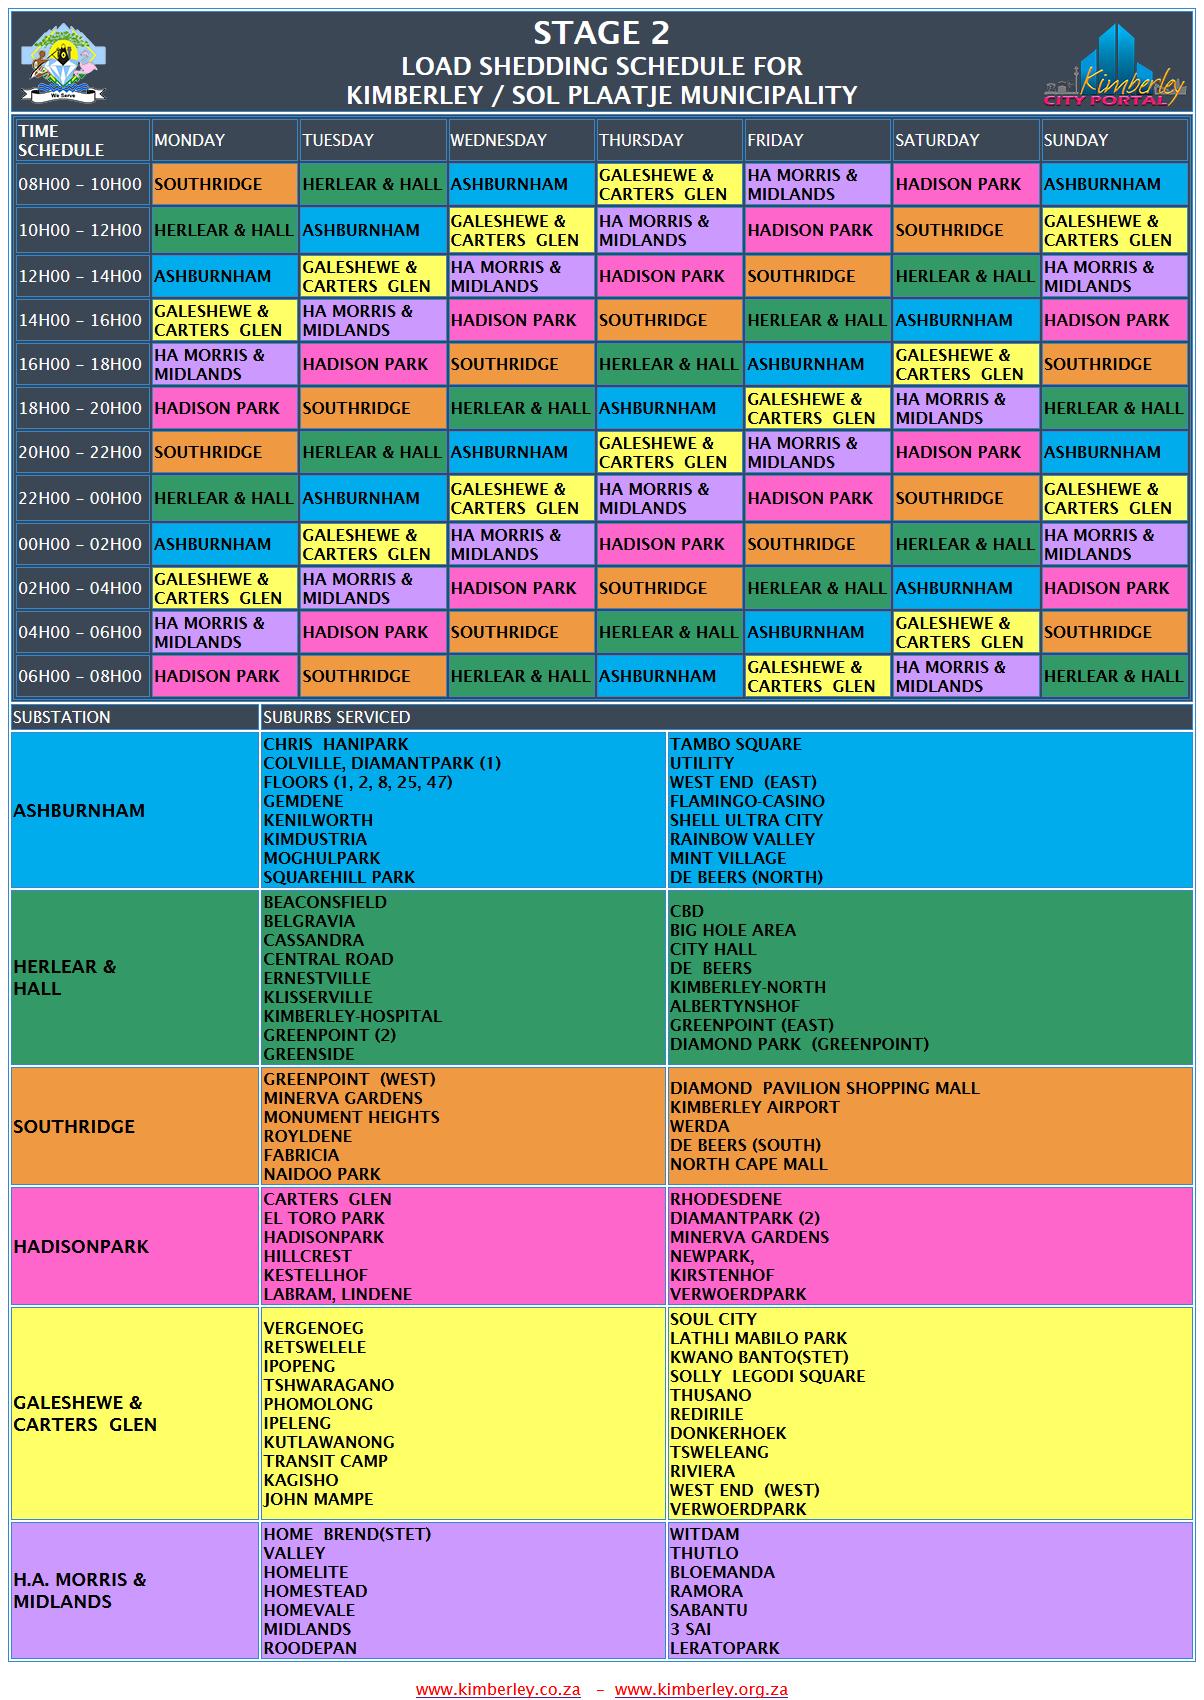 Kimberley Sol Plaatje Stage 2 Loadshedding Schedule